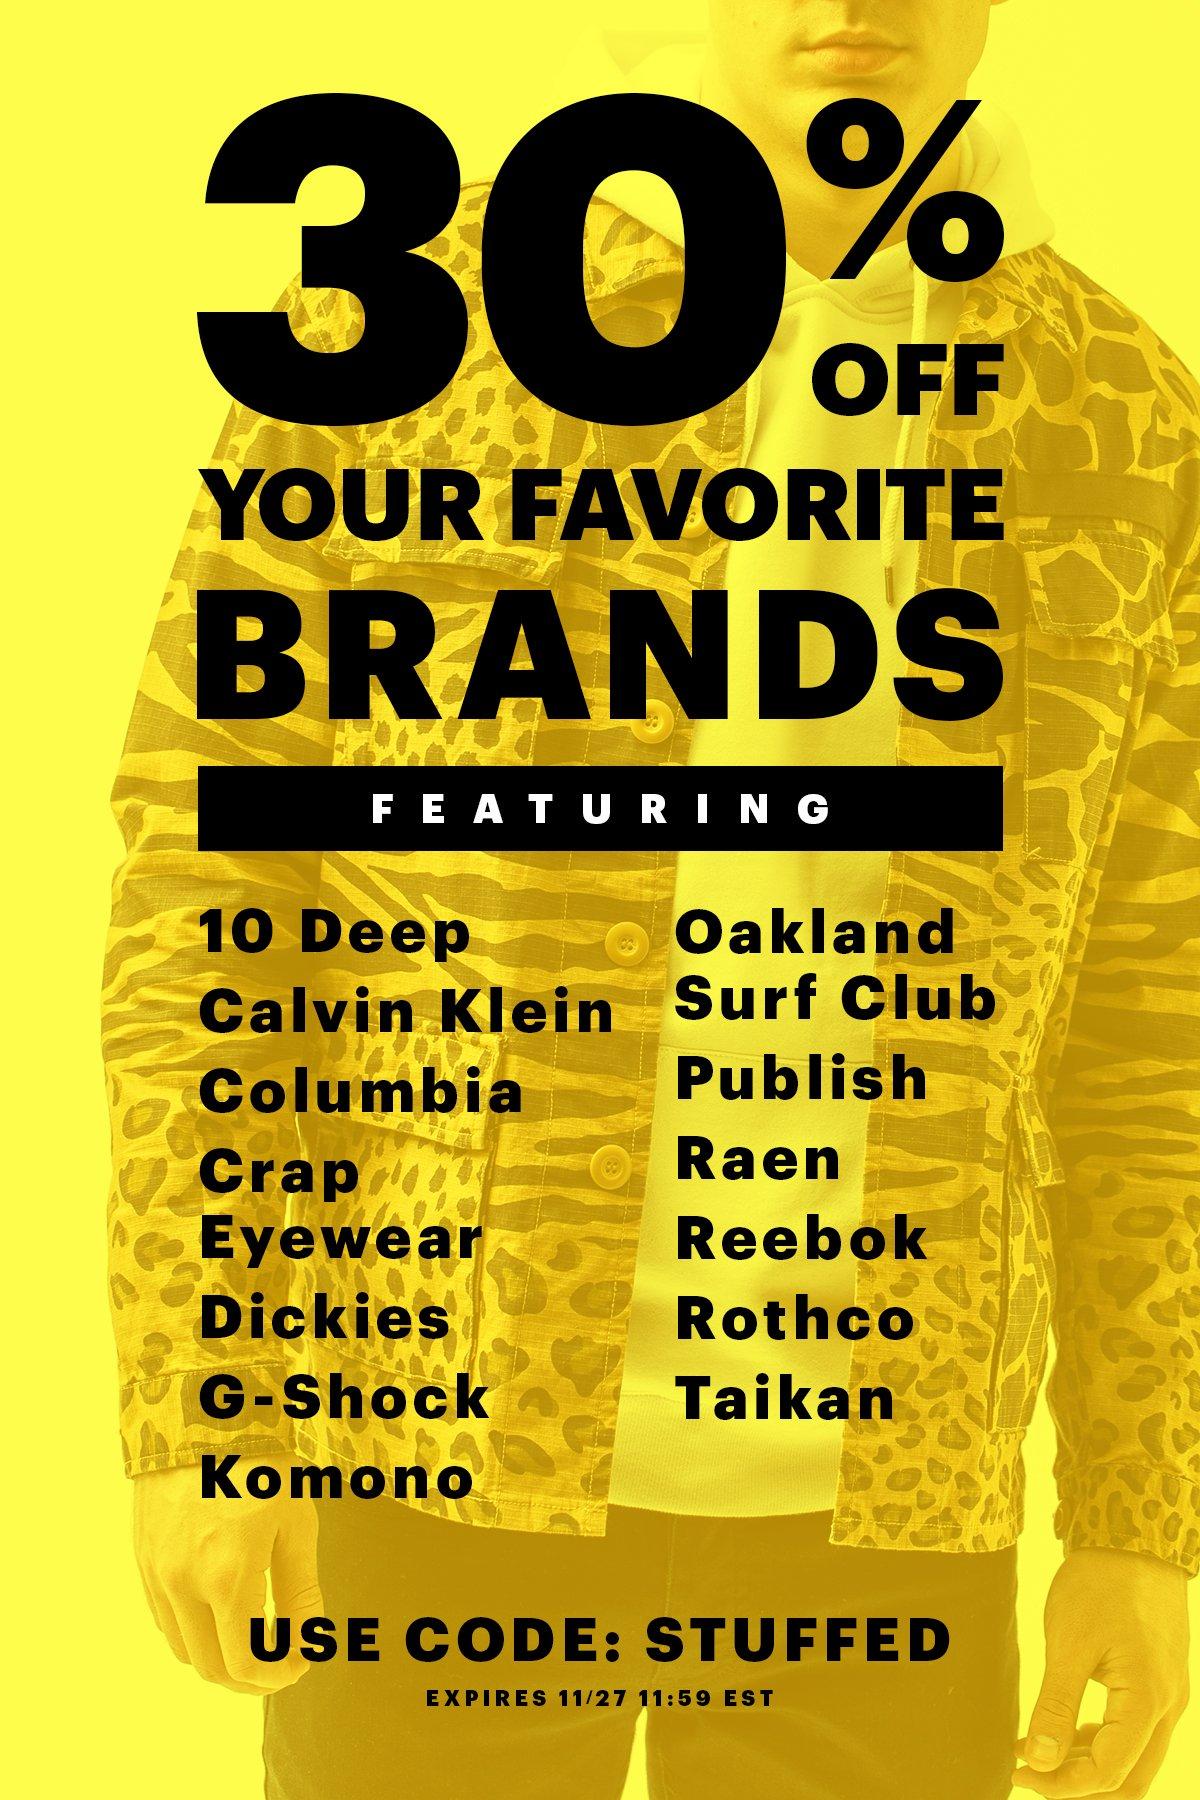 Black Friday: 30% Off Your Favorite Brands